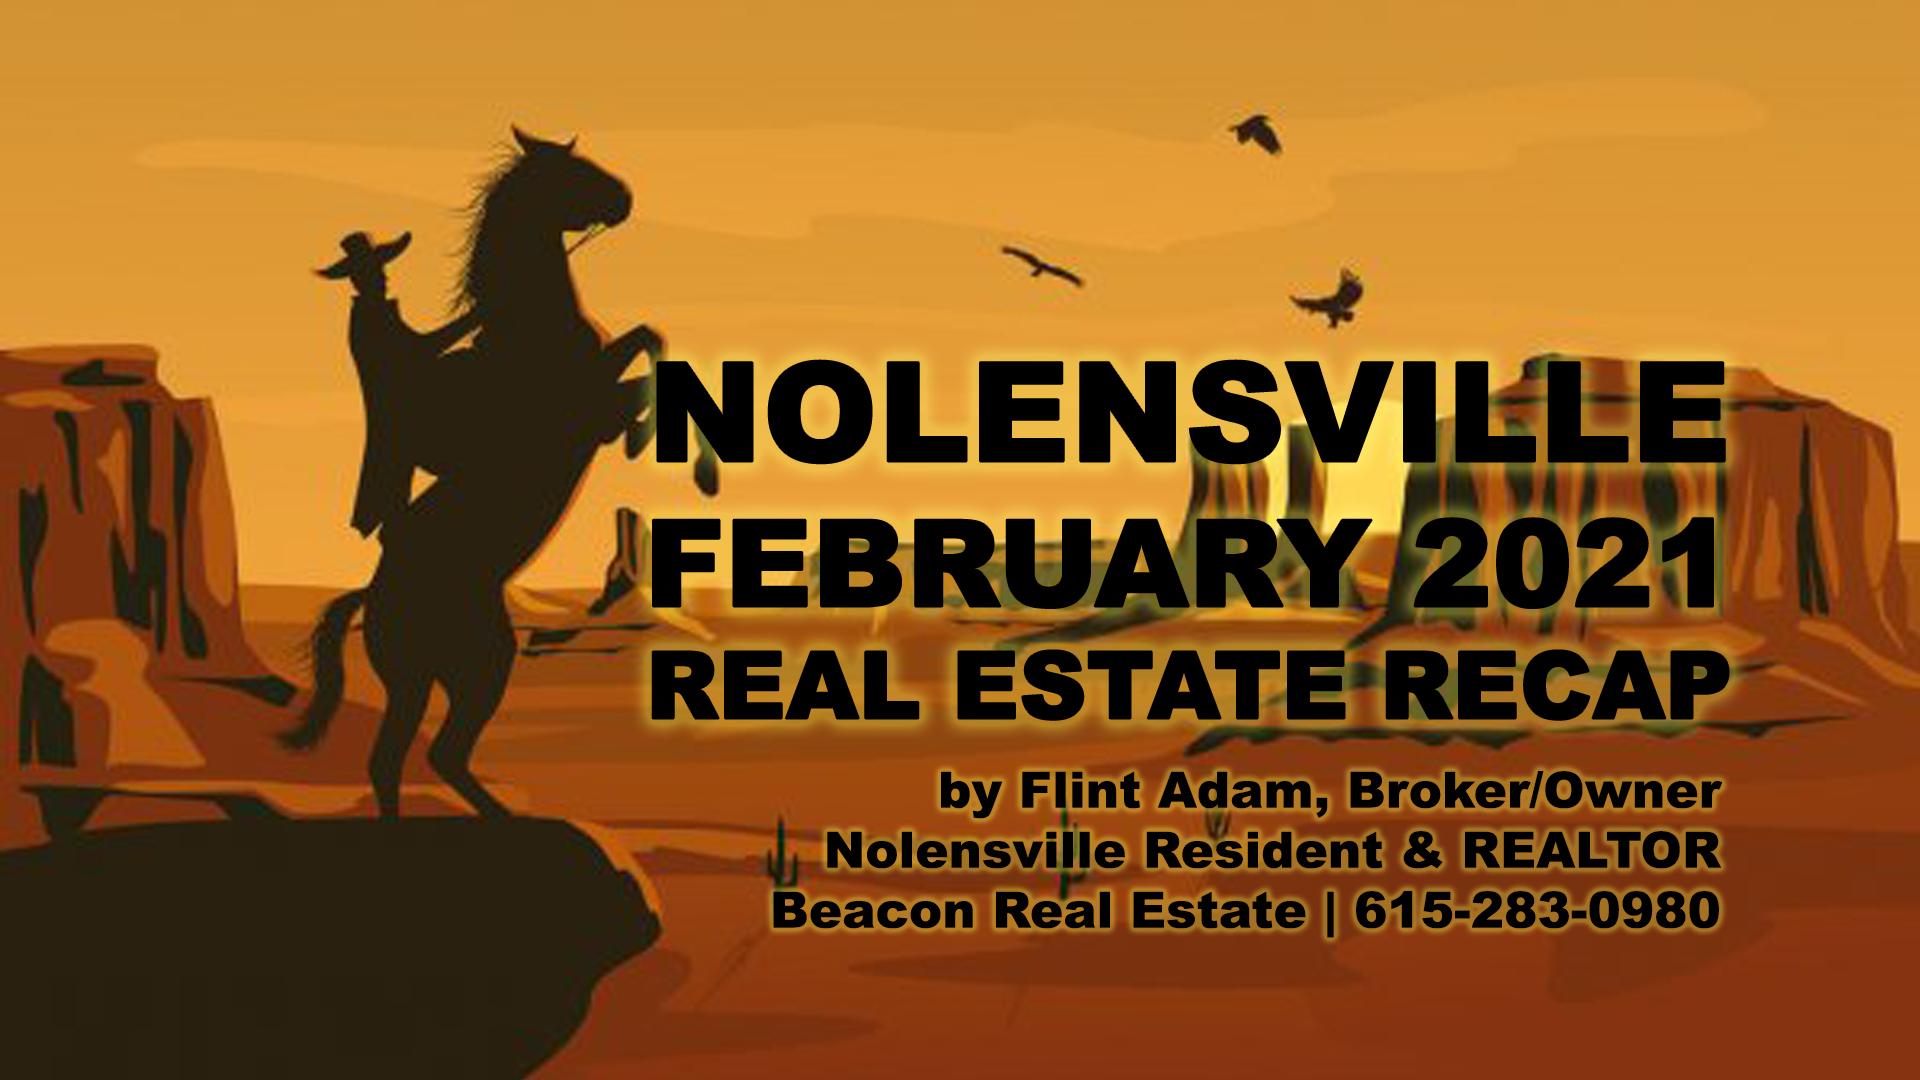 Nolensville February 2021 Real Estate Recap